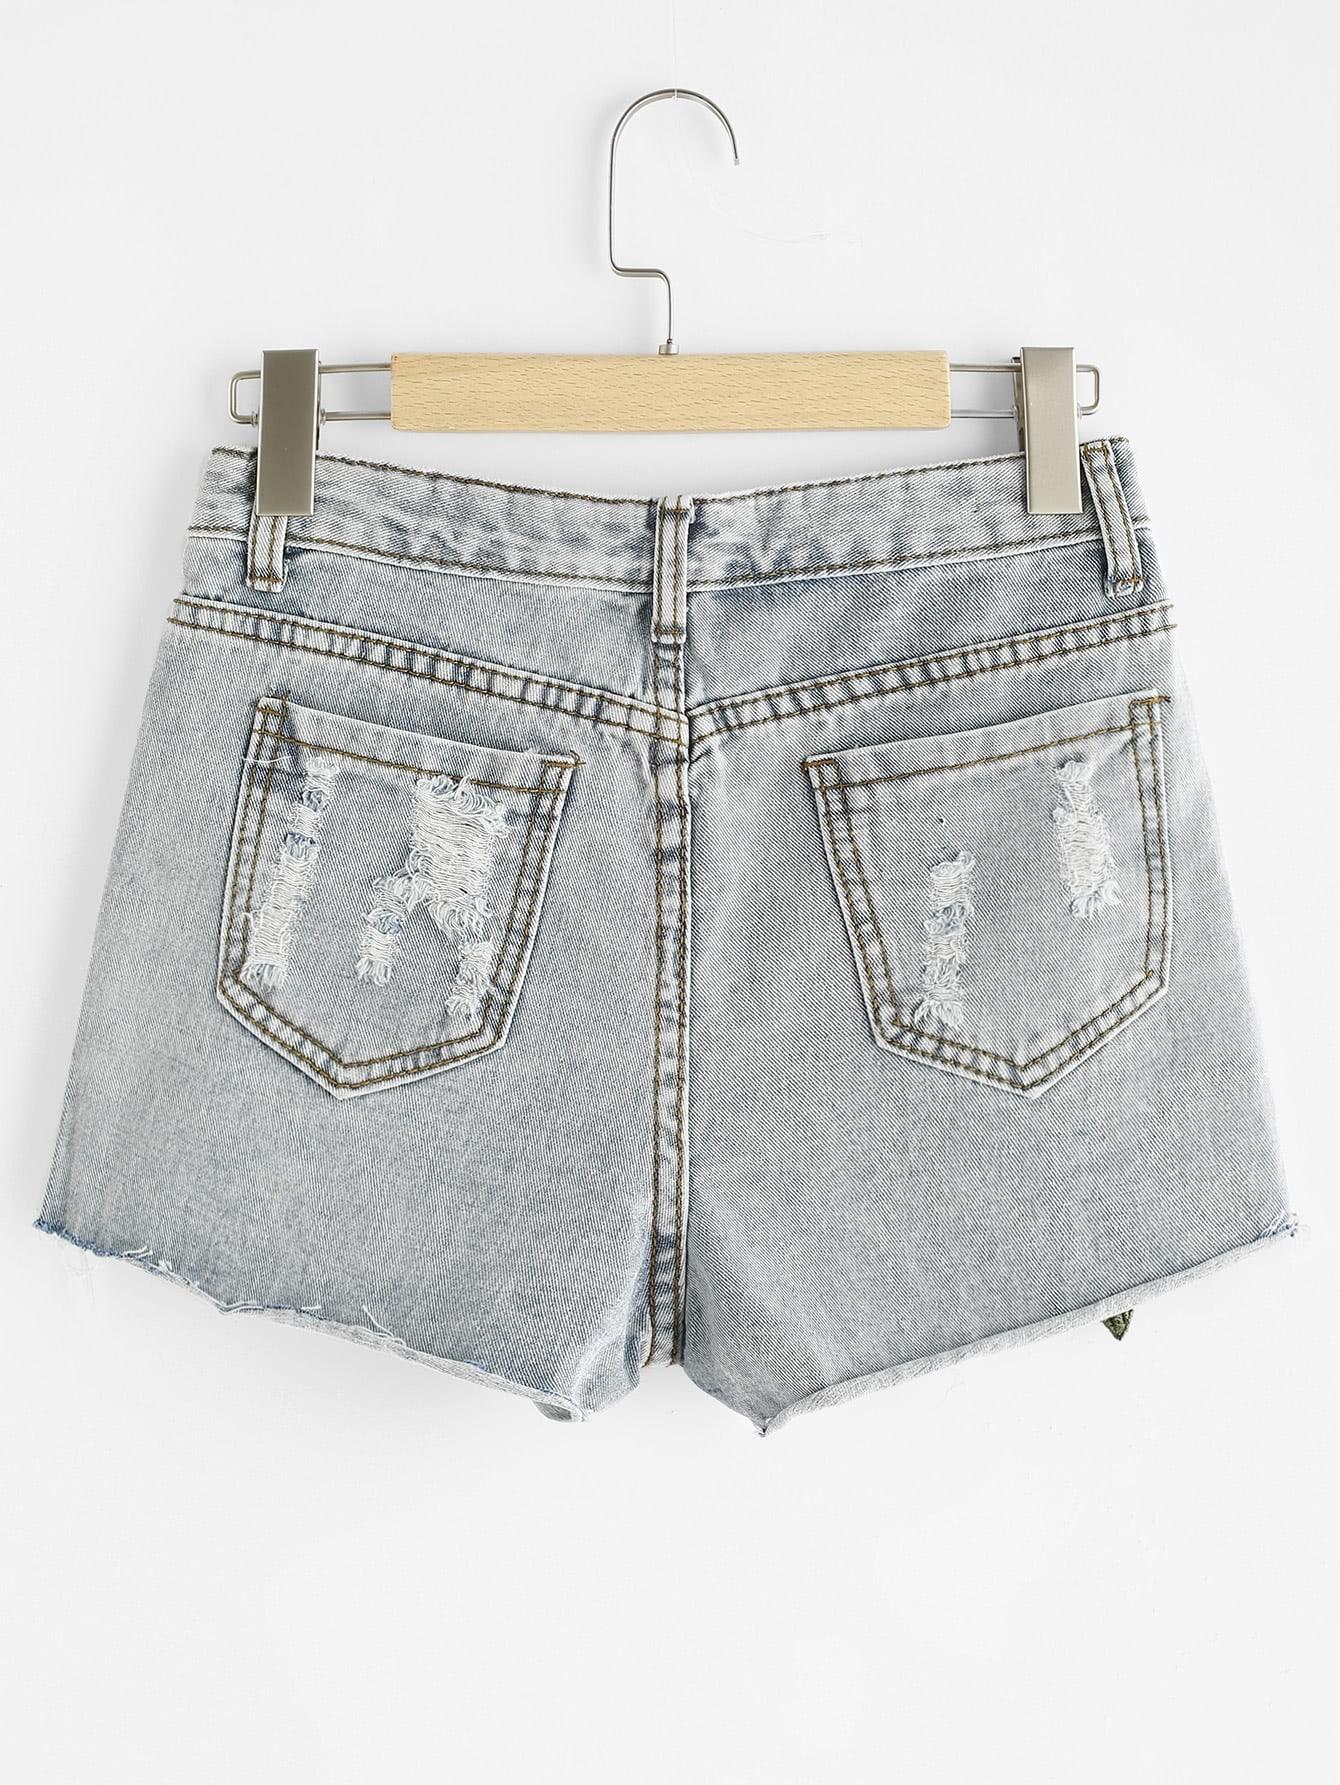 shorts170413001_2